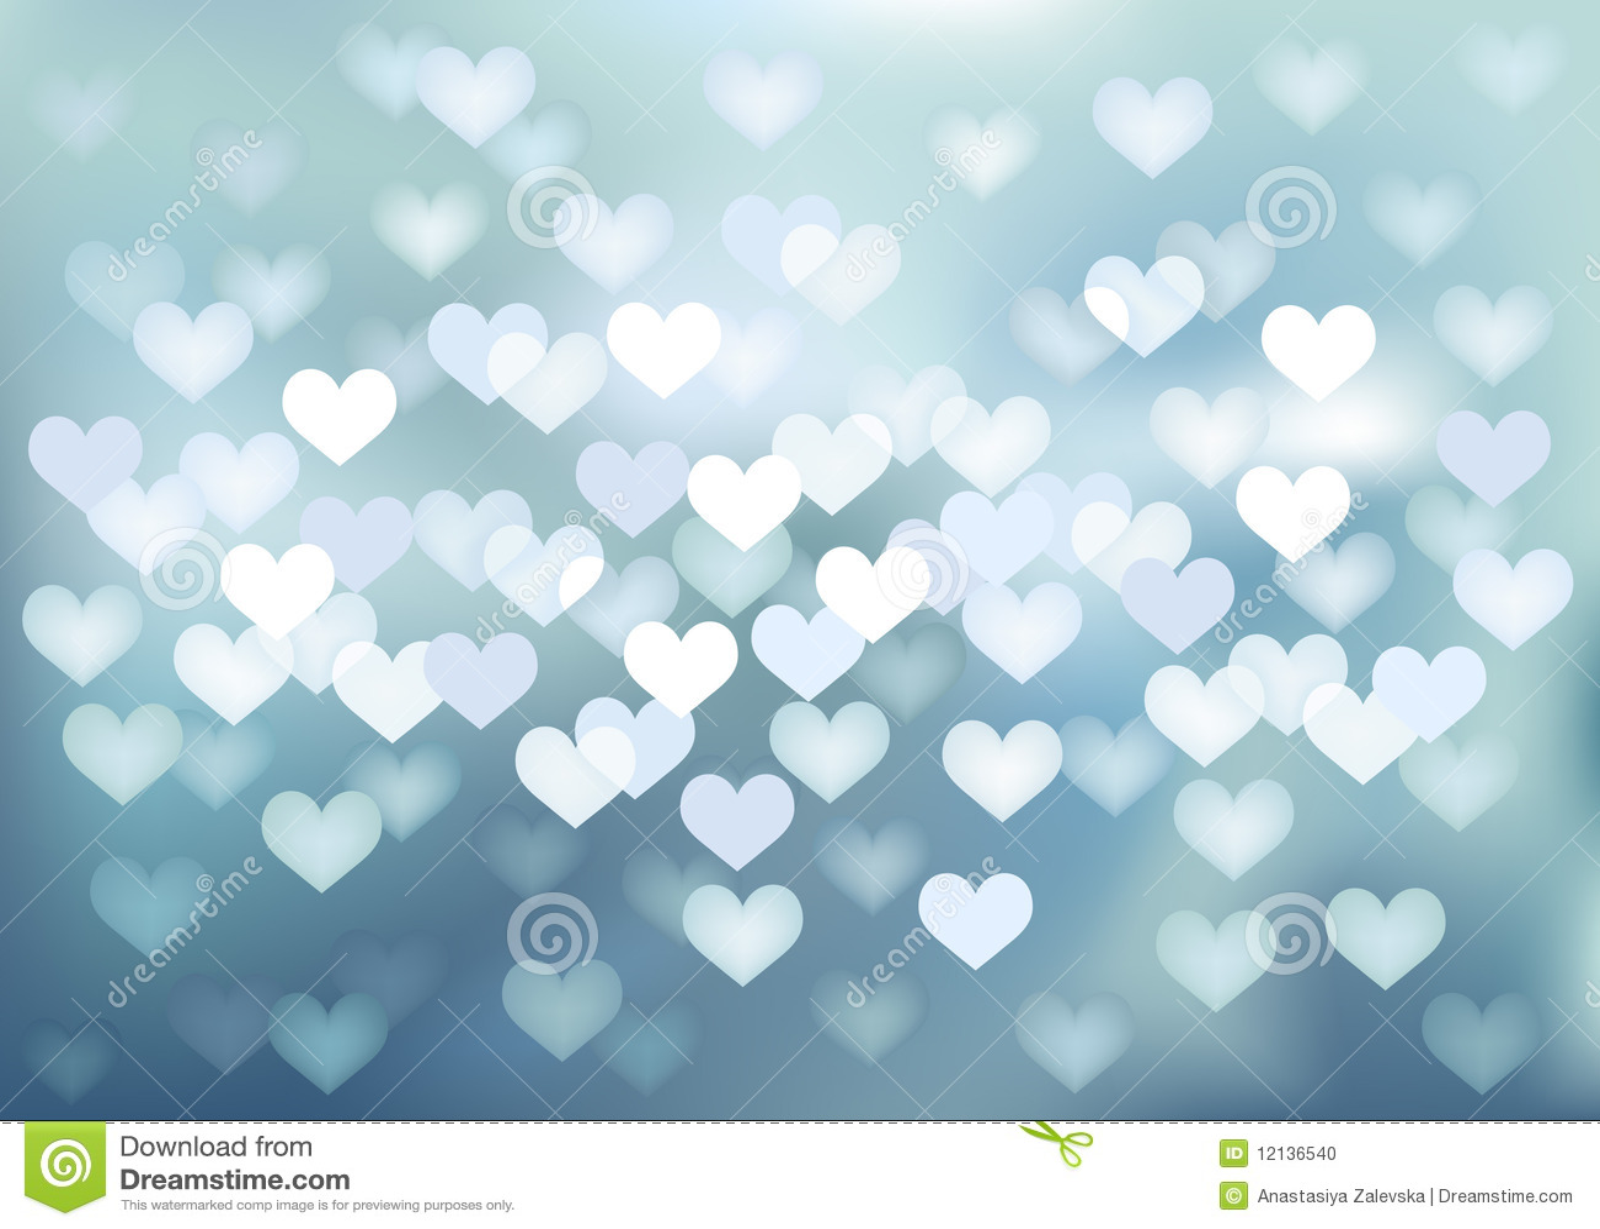 Vector Defocused Lights In Heart Shape Stock Photo Image